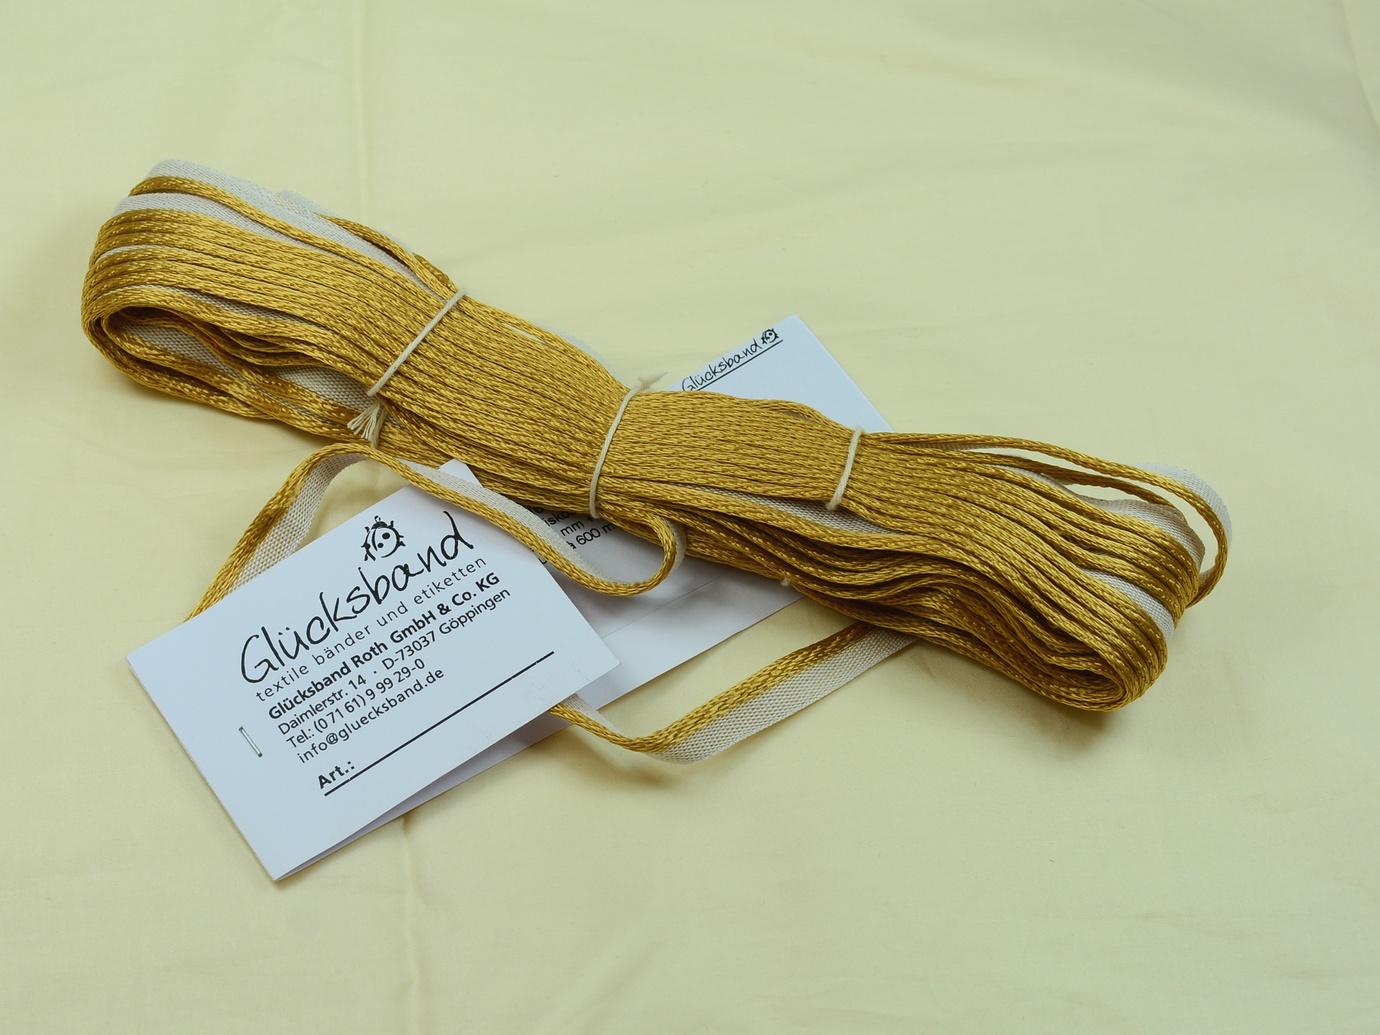 Glanzbiese Gold